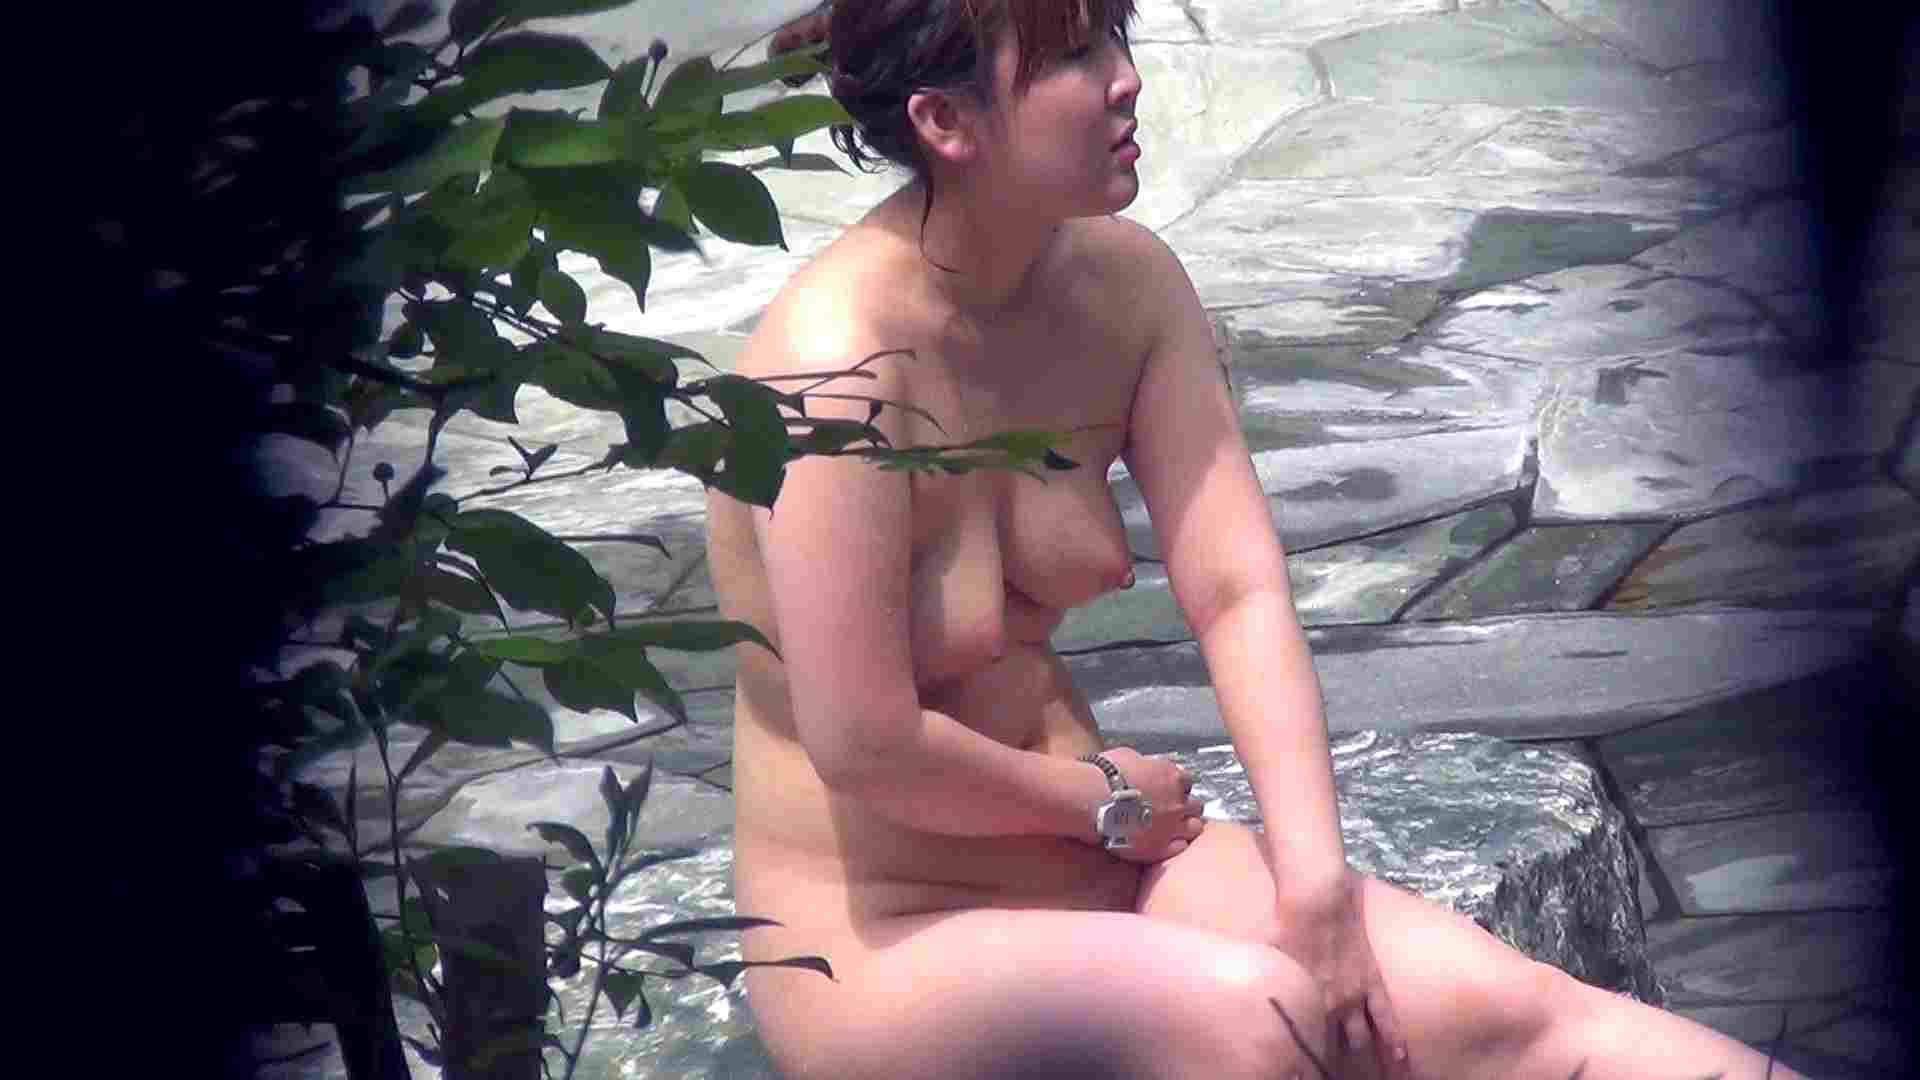 Vol.45 今度はshimaiでしょうか ムッチリ嬢の大胆開脚 美女 AV無料 54連発 27